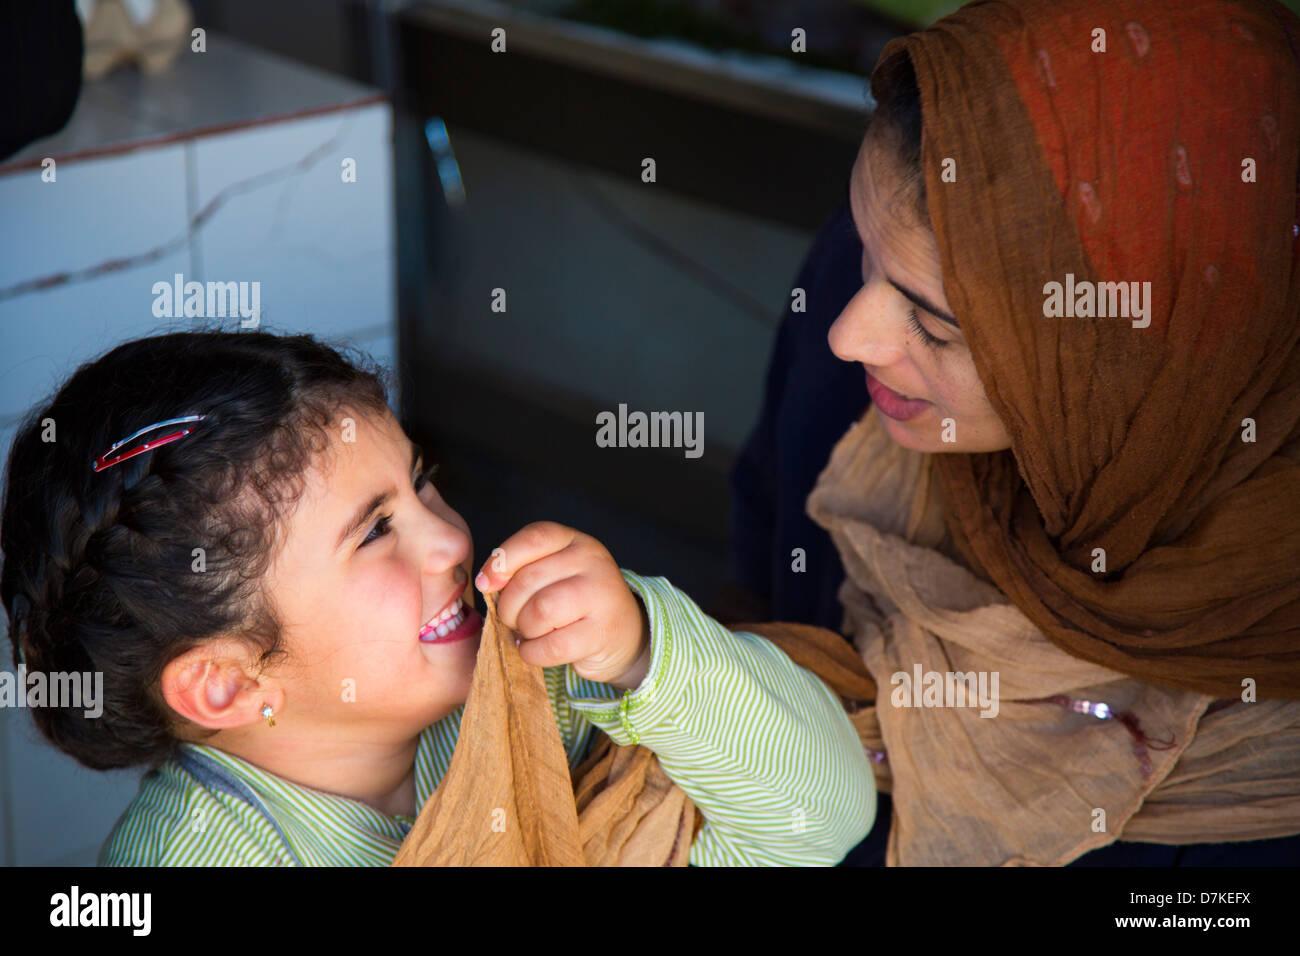 Arab adult chat